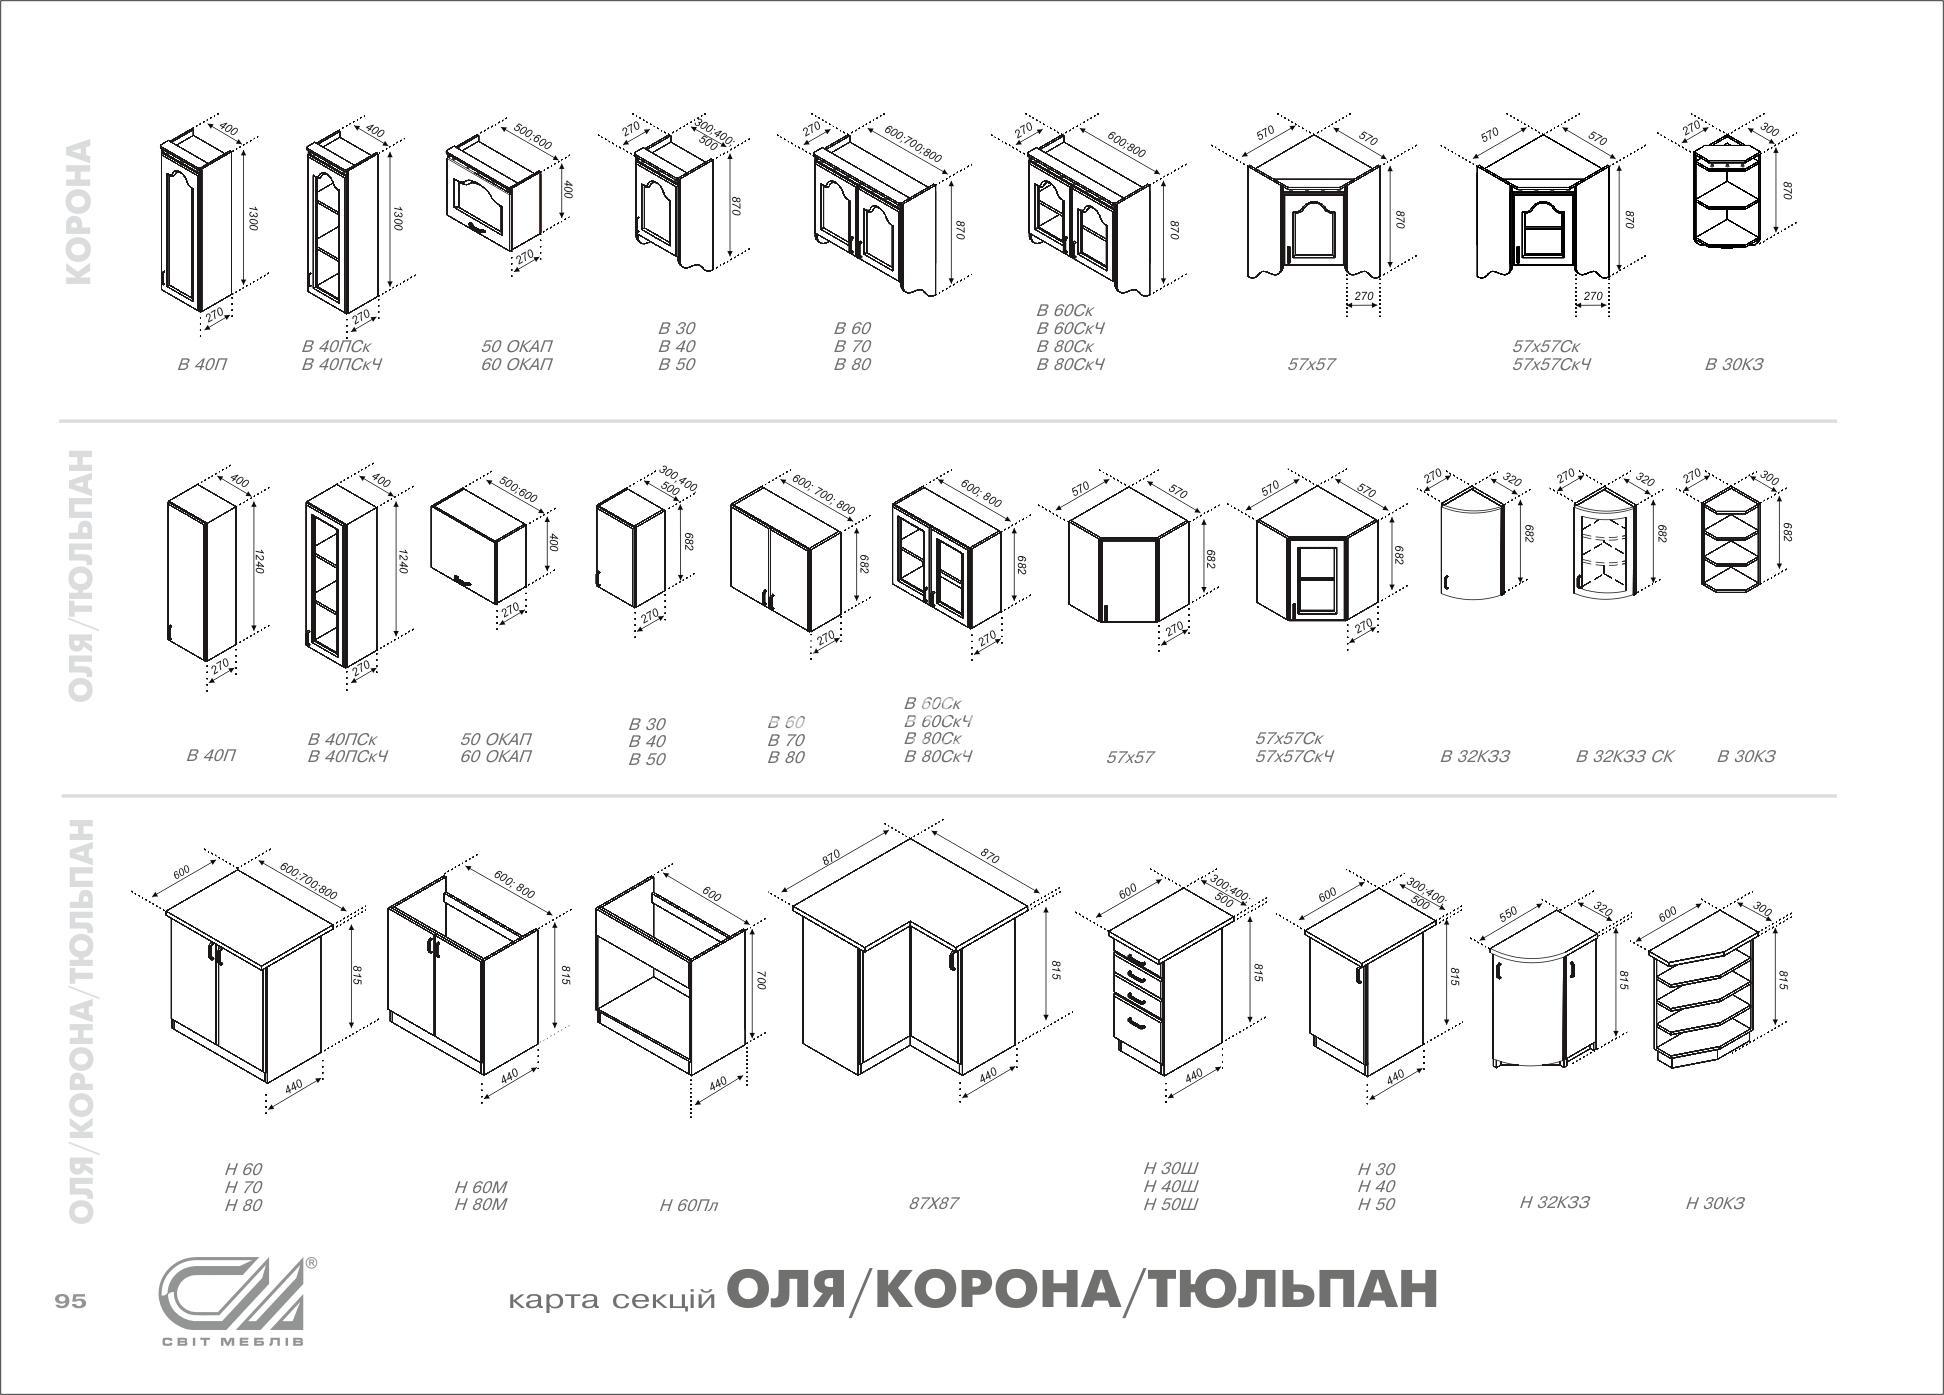 кухонная тумба напольная фото: http://zts-spb.ru/page/kuhonnaya_tumba_napolnaya_foto/